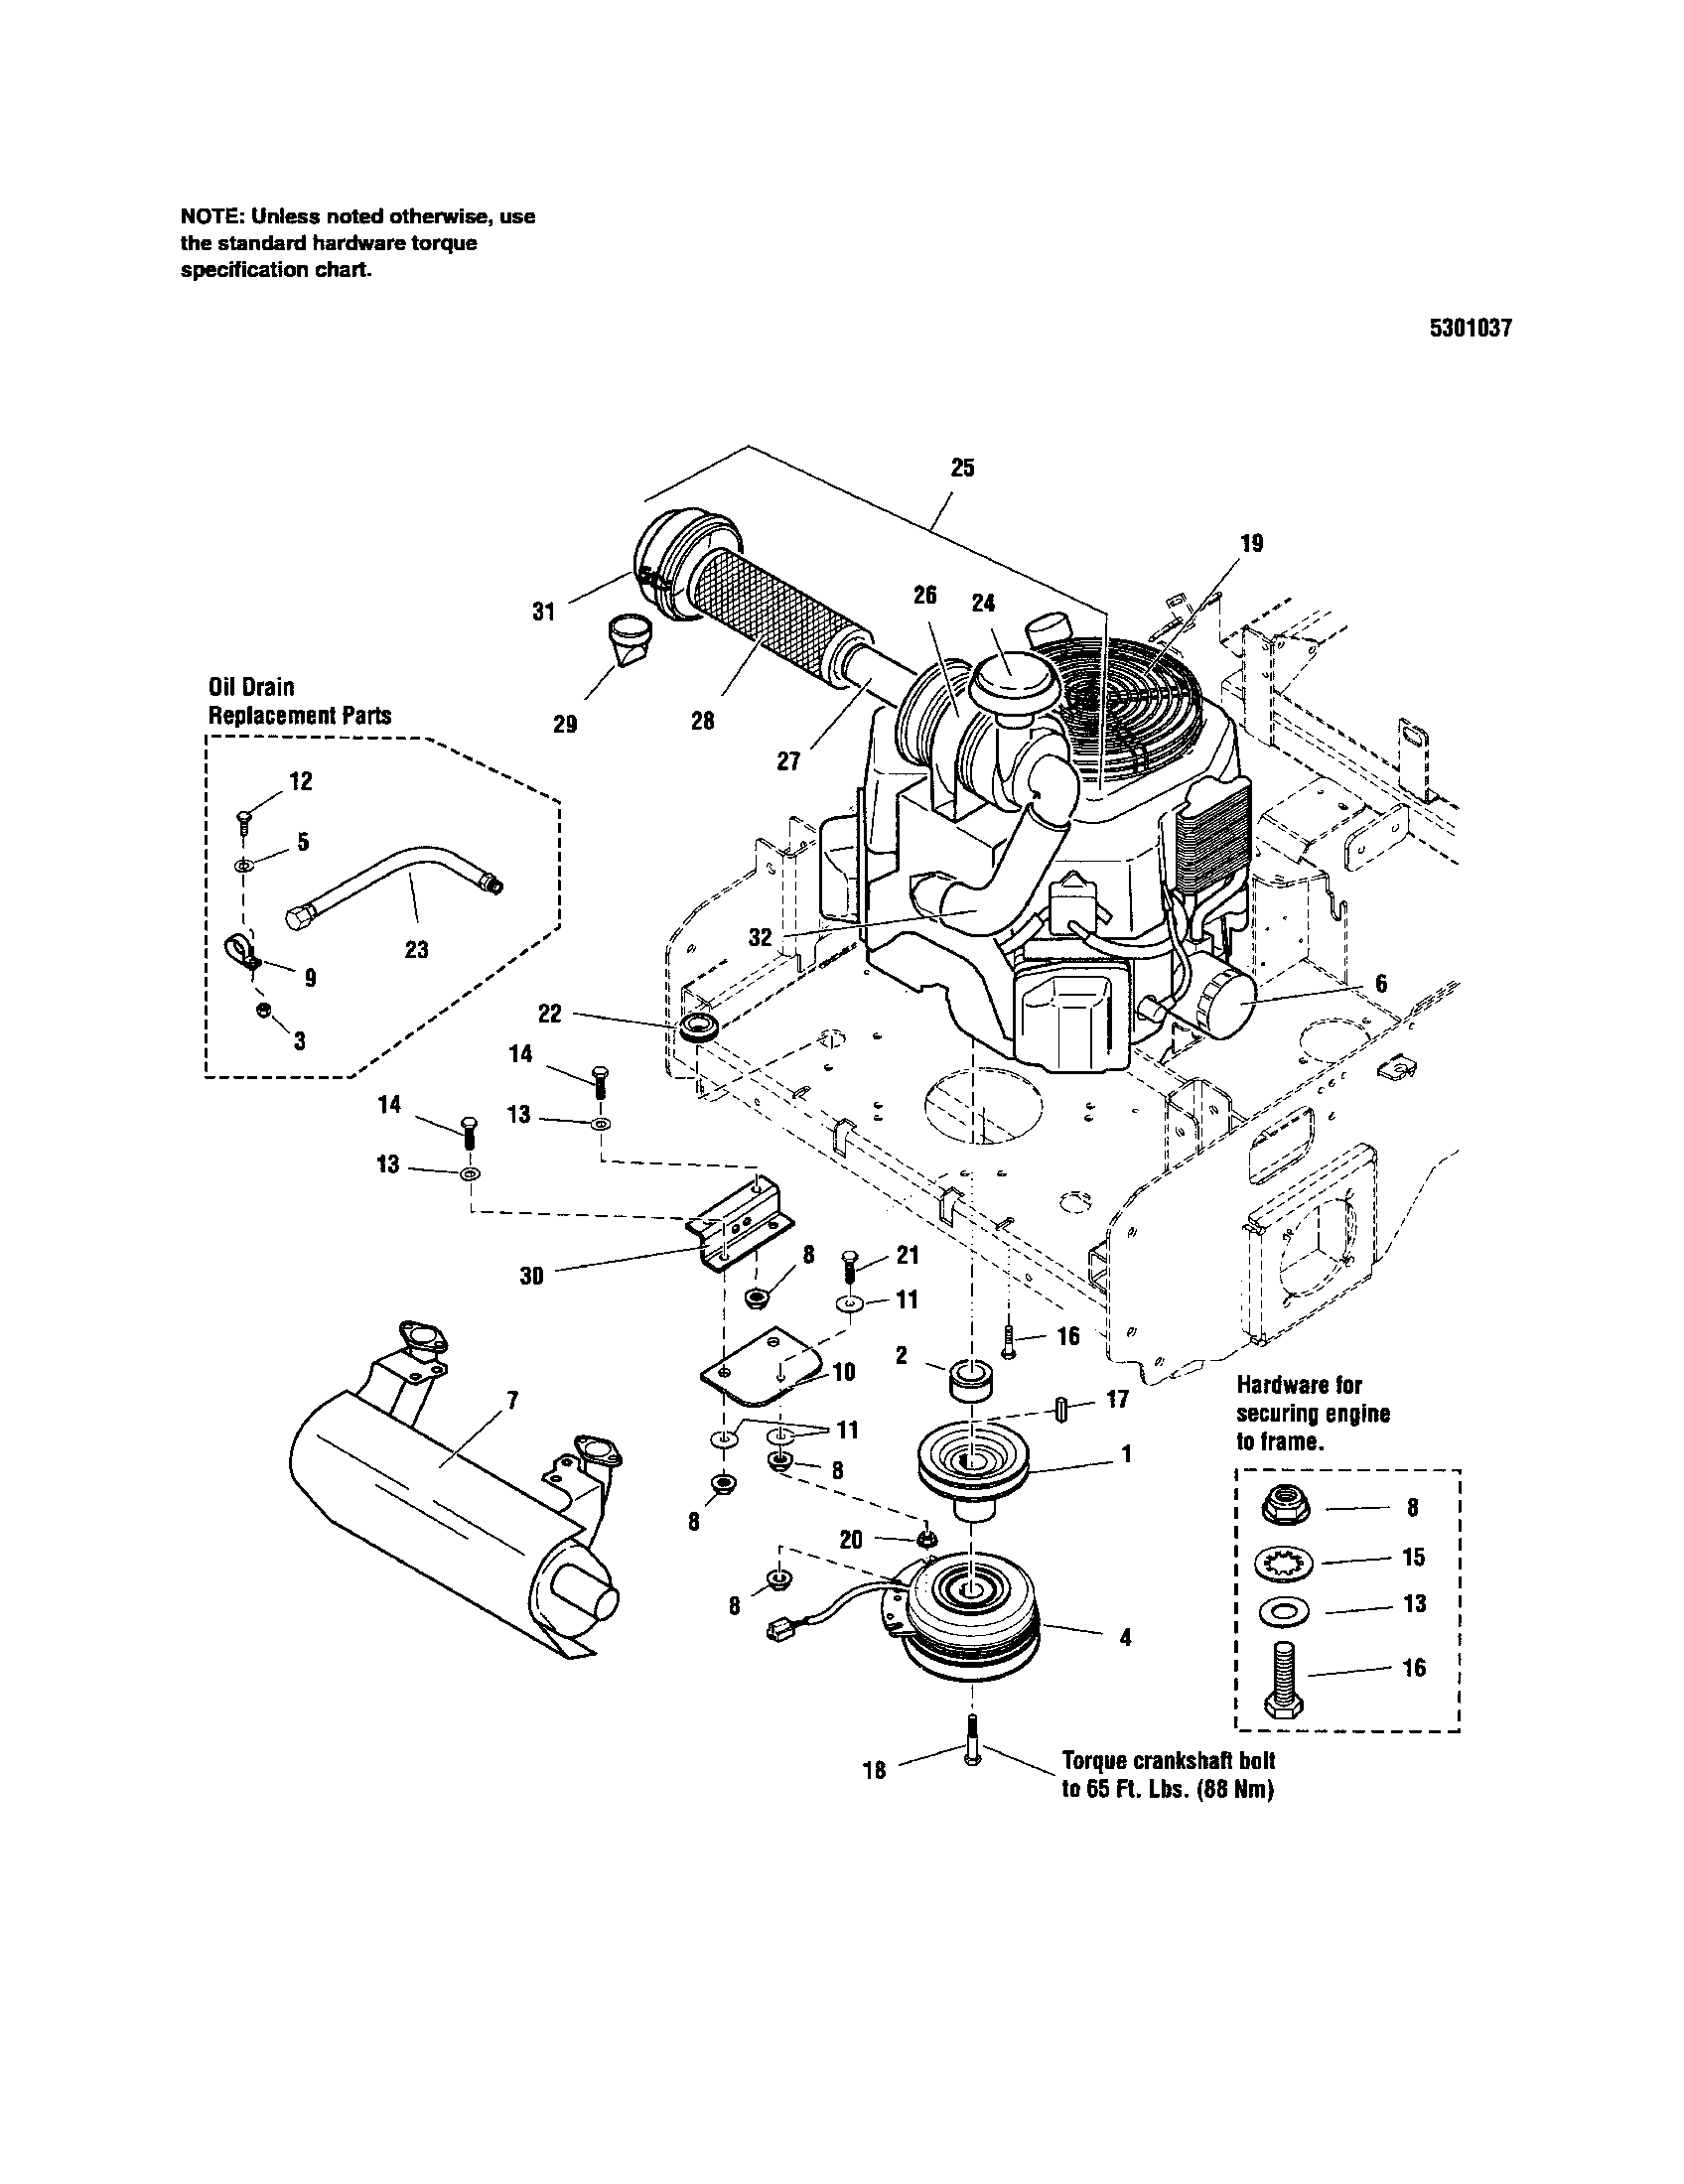 Admirable Kohler Engine Parts Diagram Wiring Diagram Wiring Cloud Intelaidewilluminateatxorg